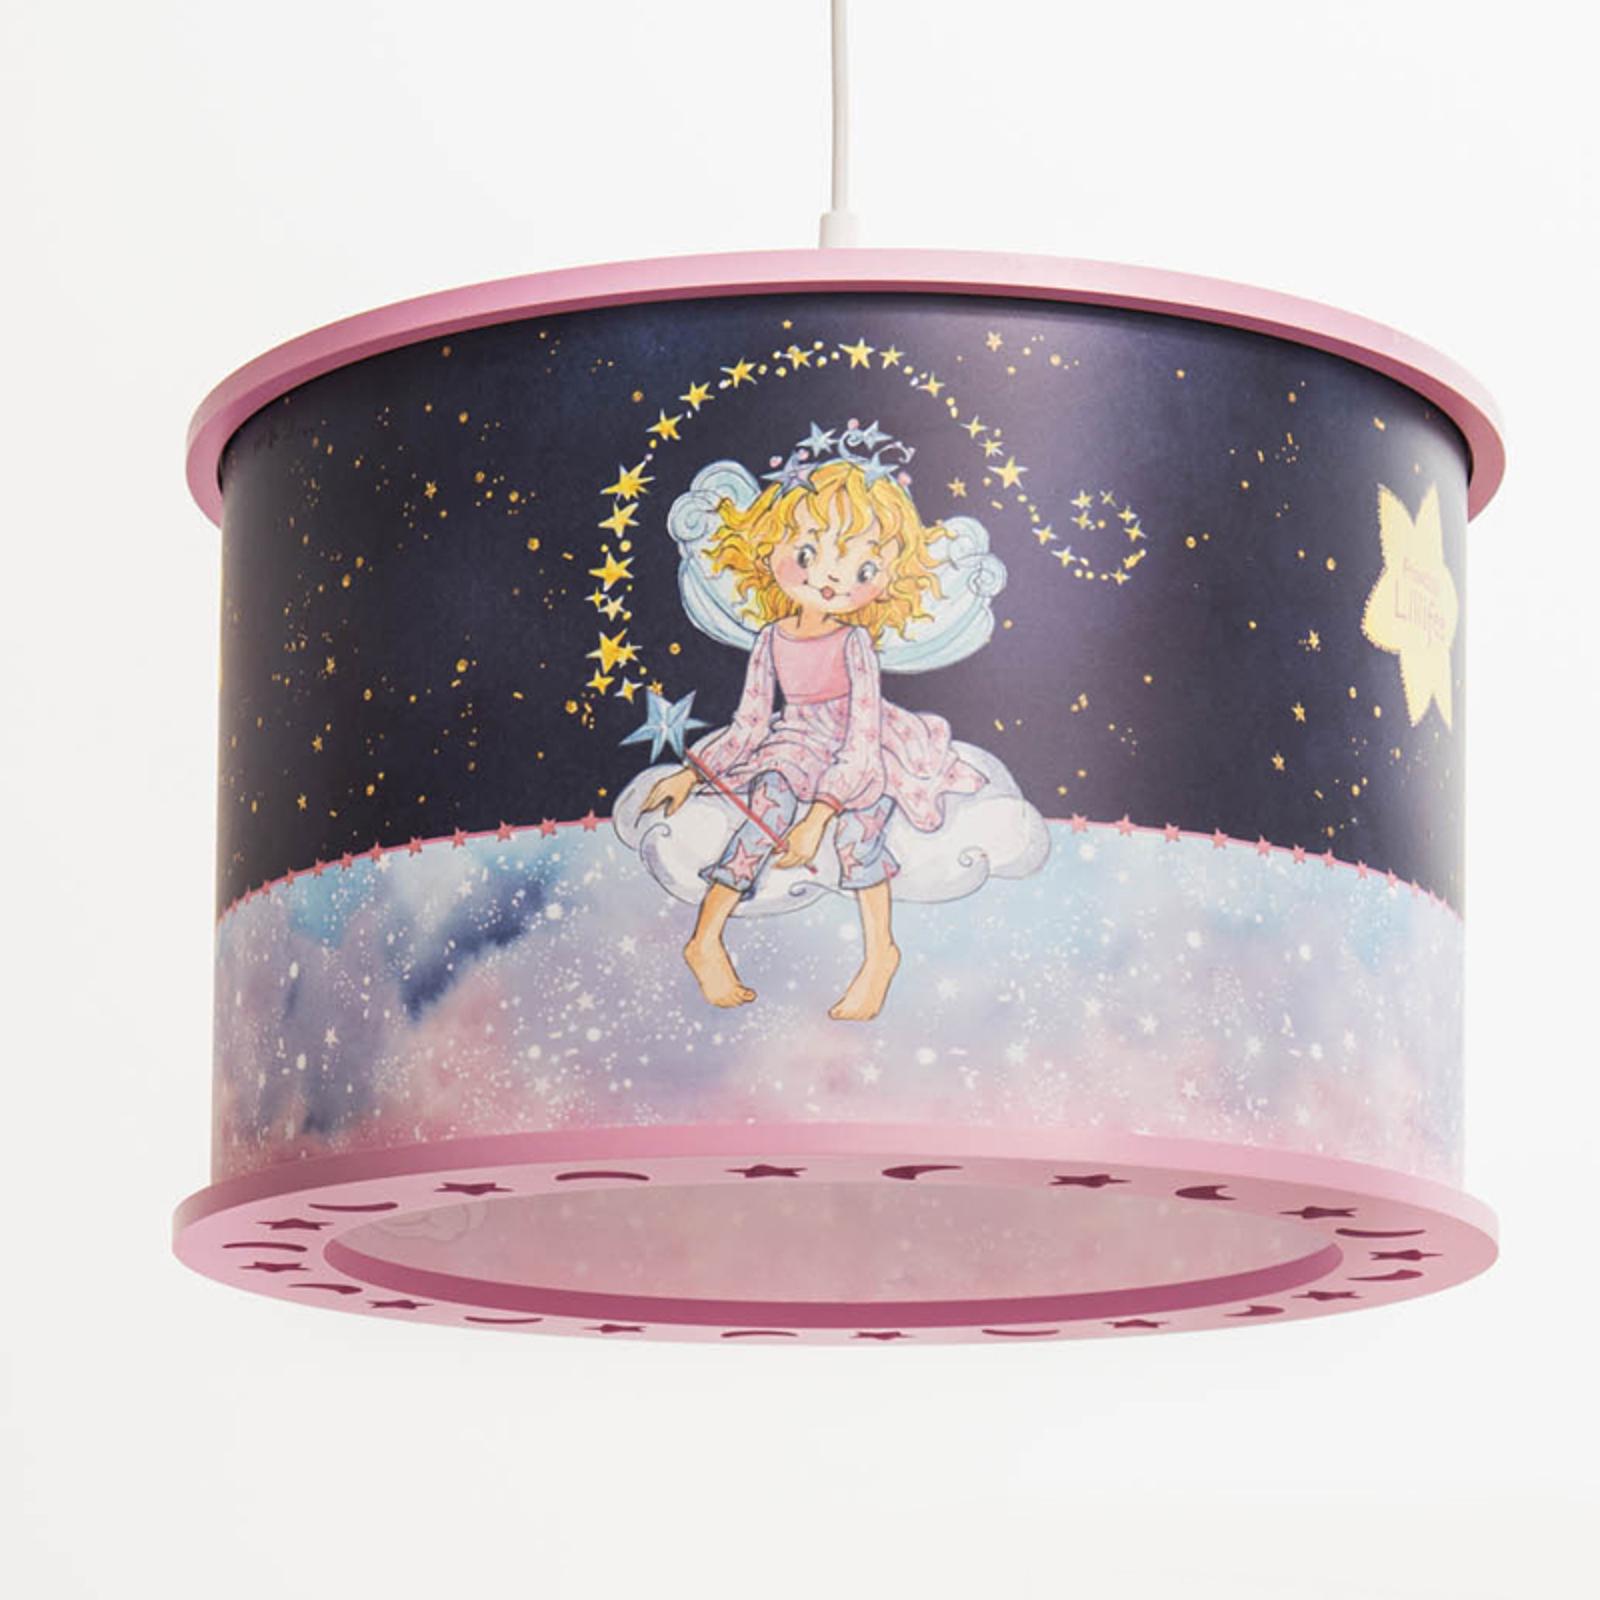 Suspension Princesse Lillifee, magie étoilée